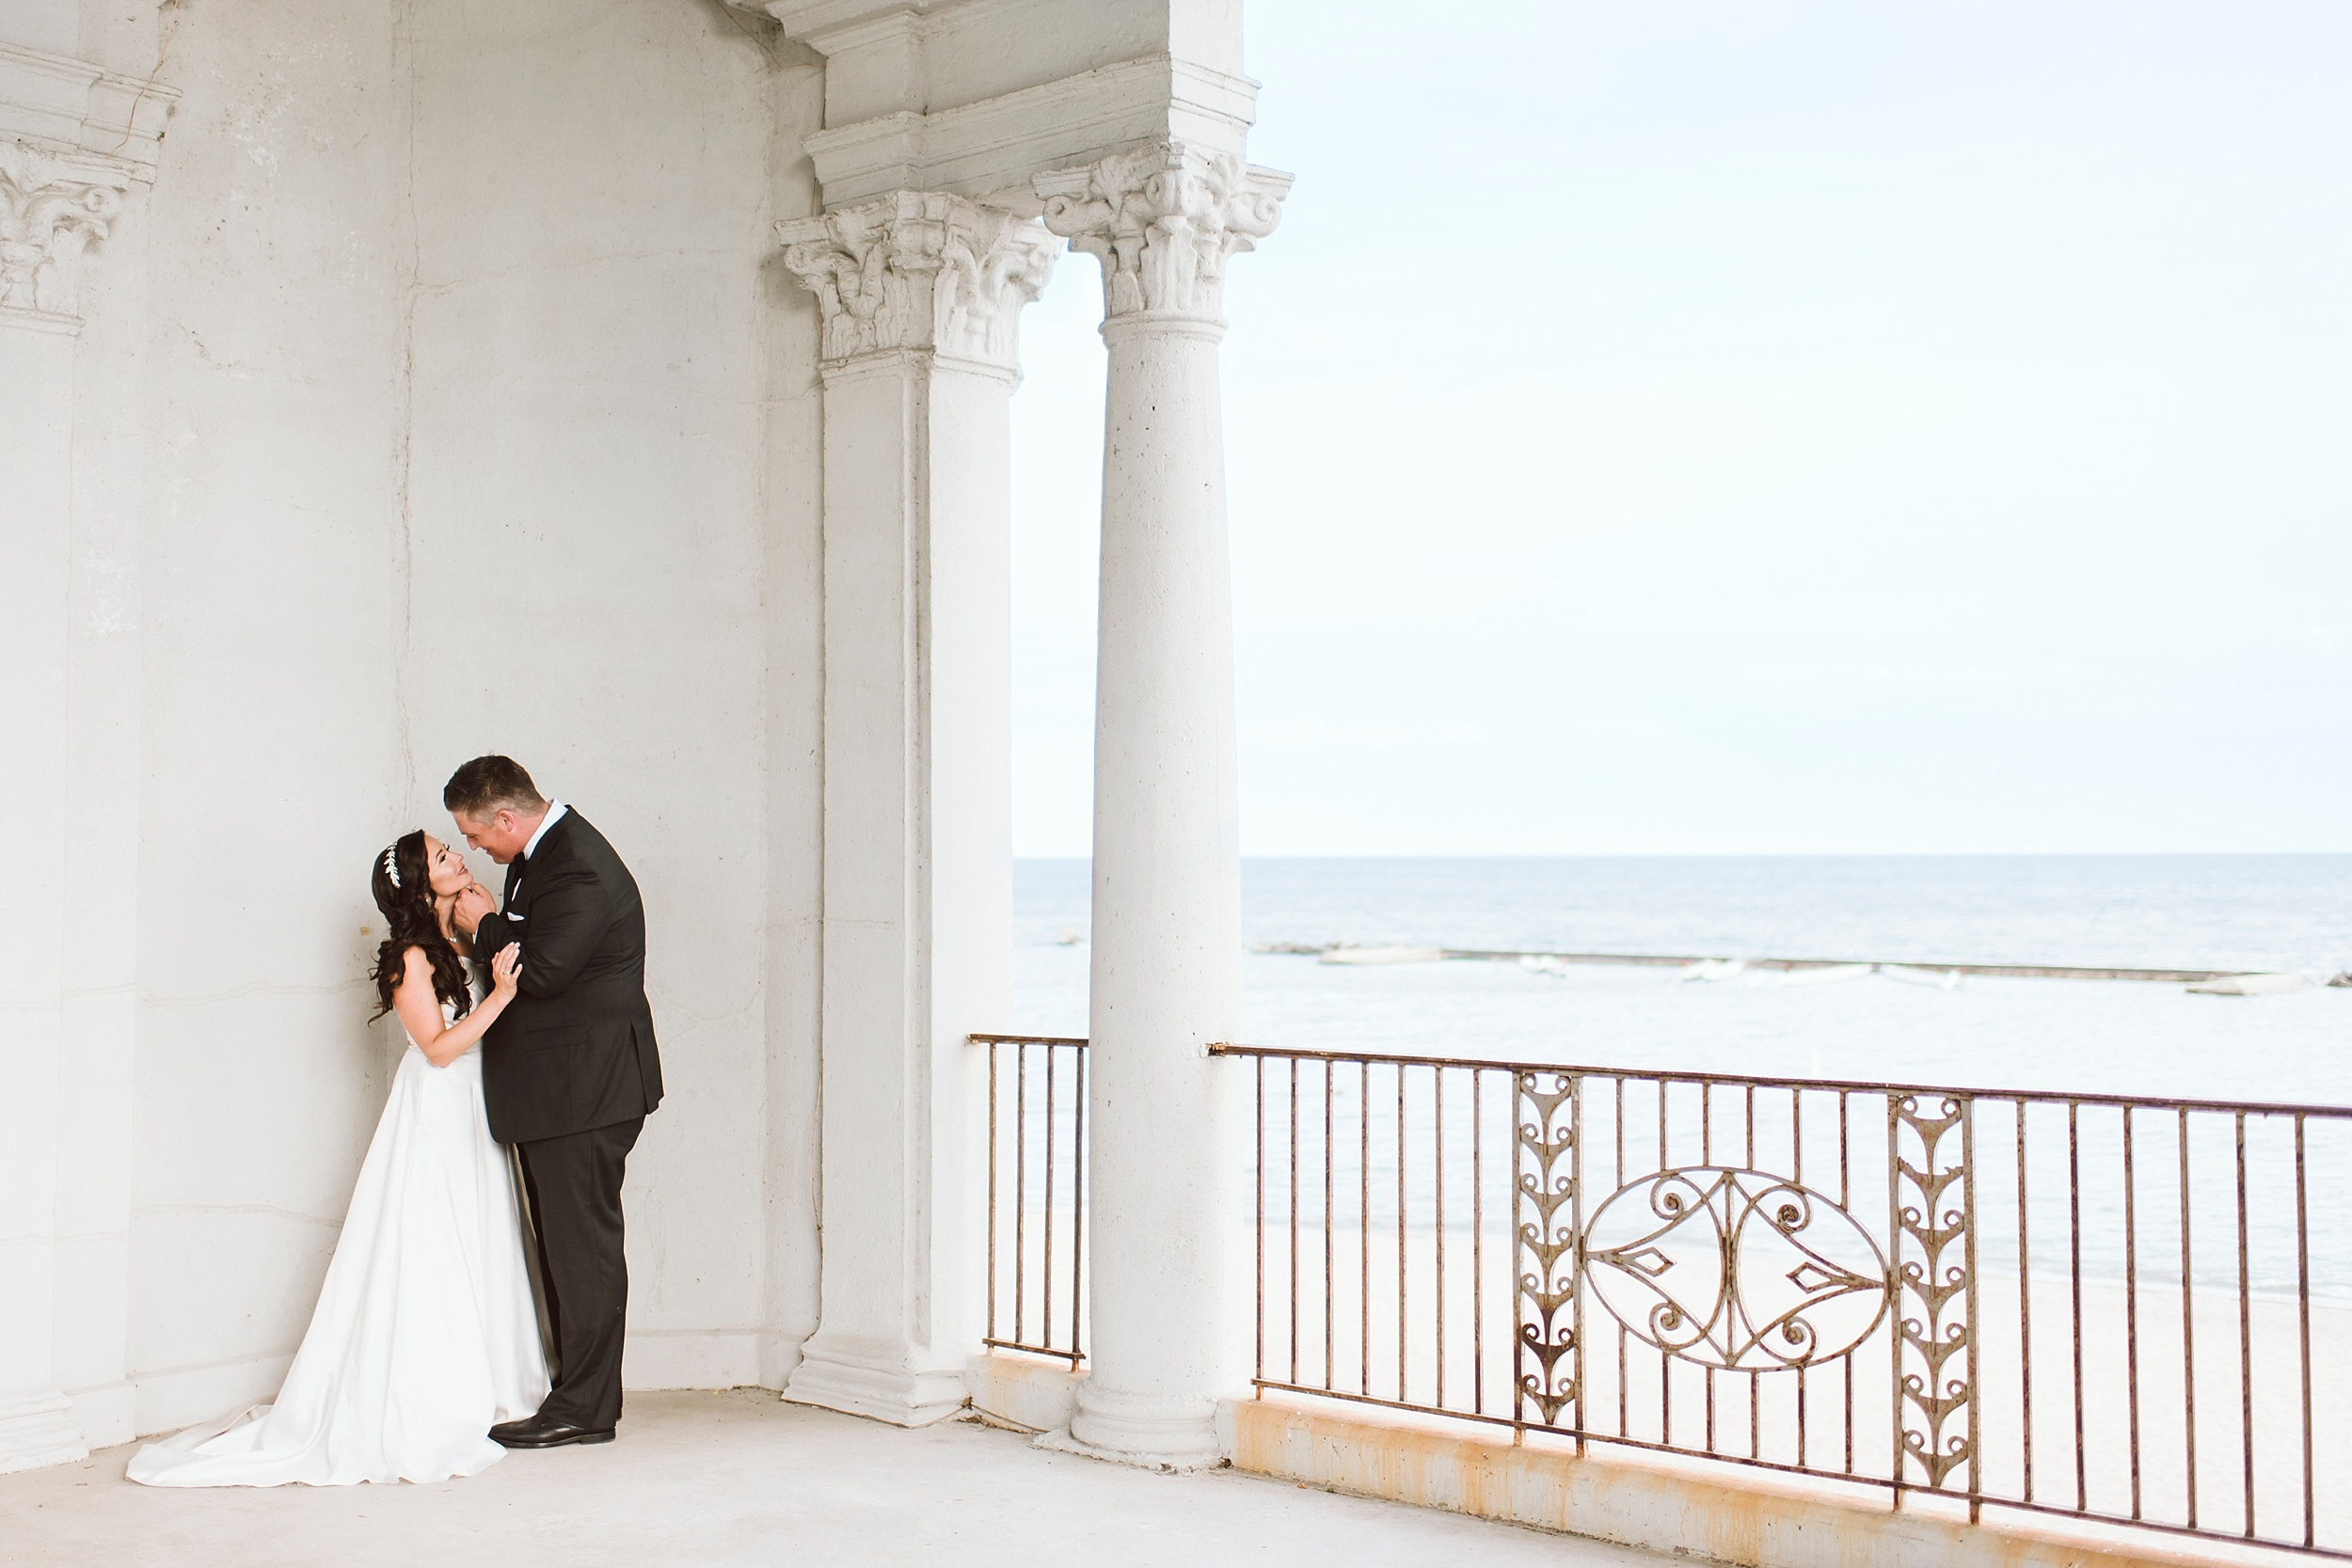 Sunnyside_Pavilion_Wedding_Toronto_Photographer_0057.jpg